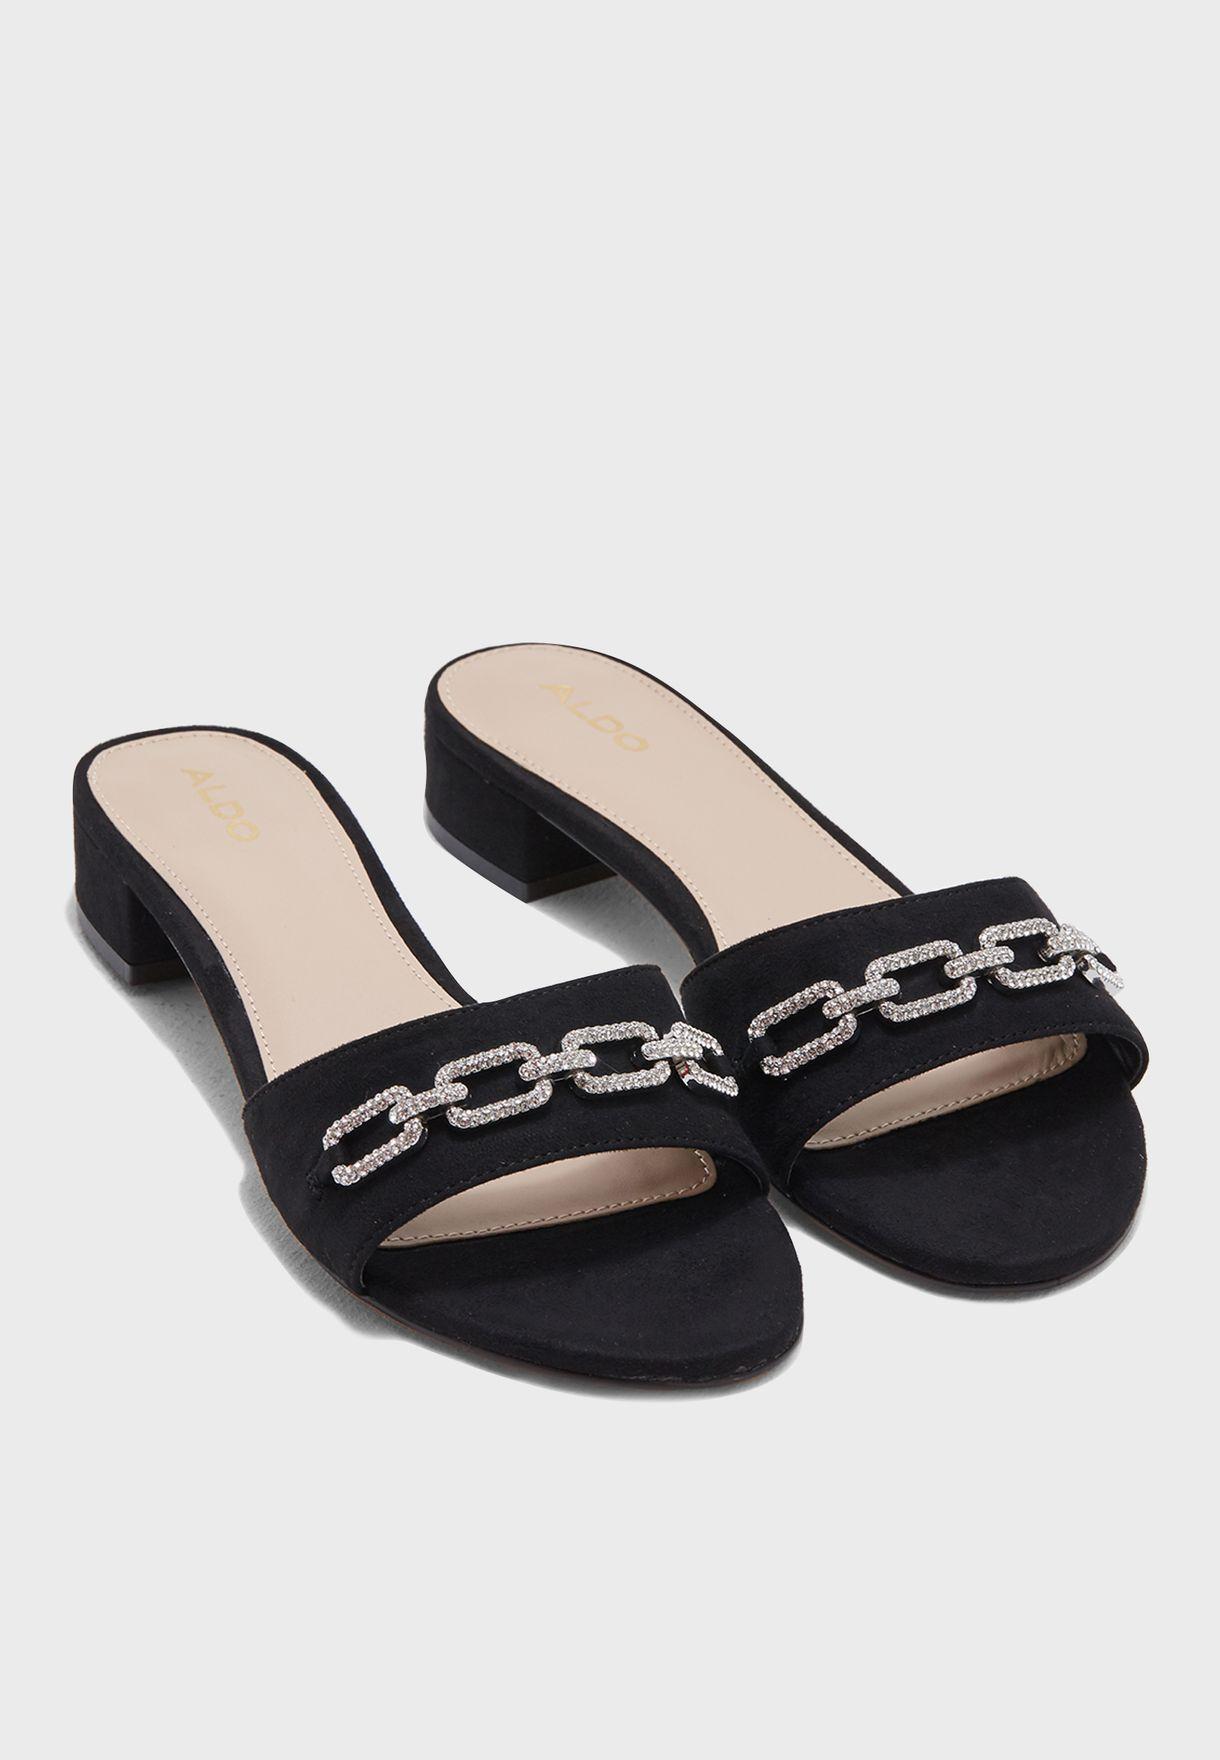 ca524a44bef Shop Aldo black Galiaclya Sandal GALIACLYA98 for Women in Saudi ...